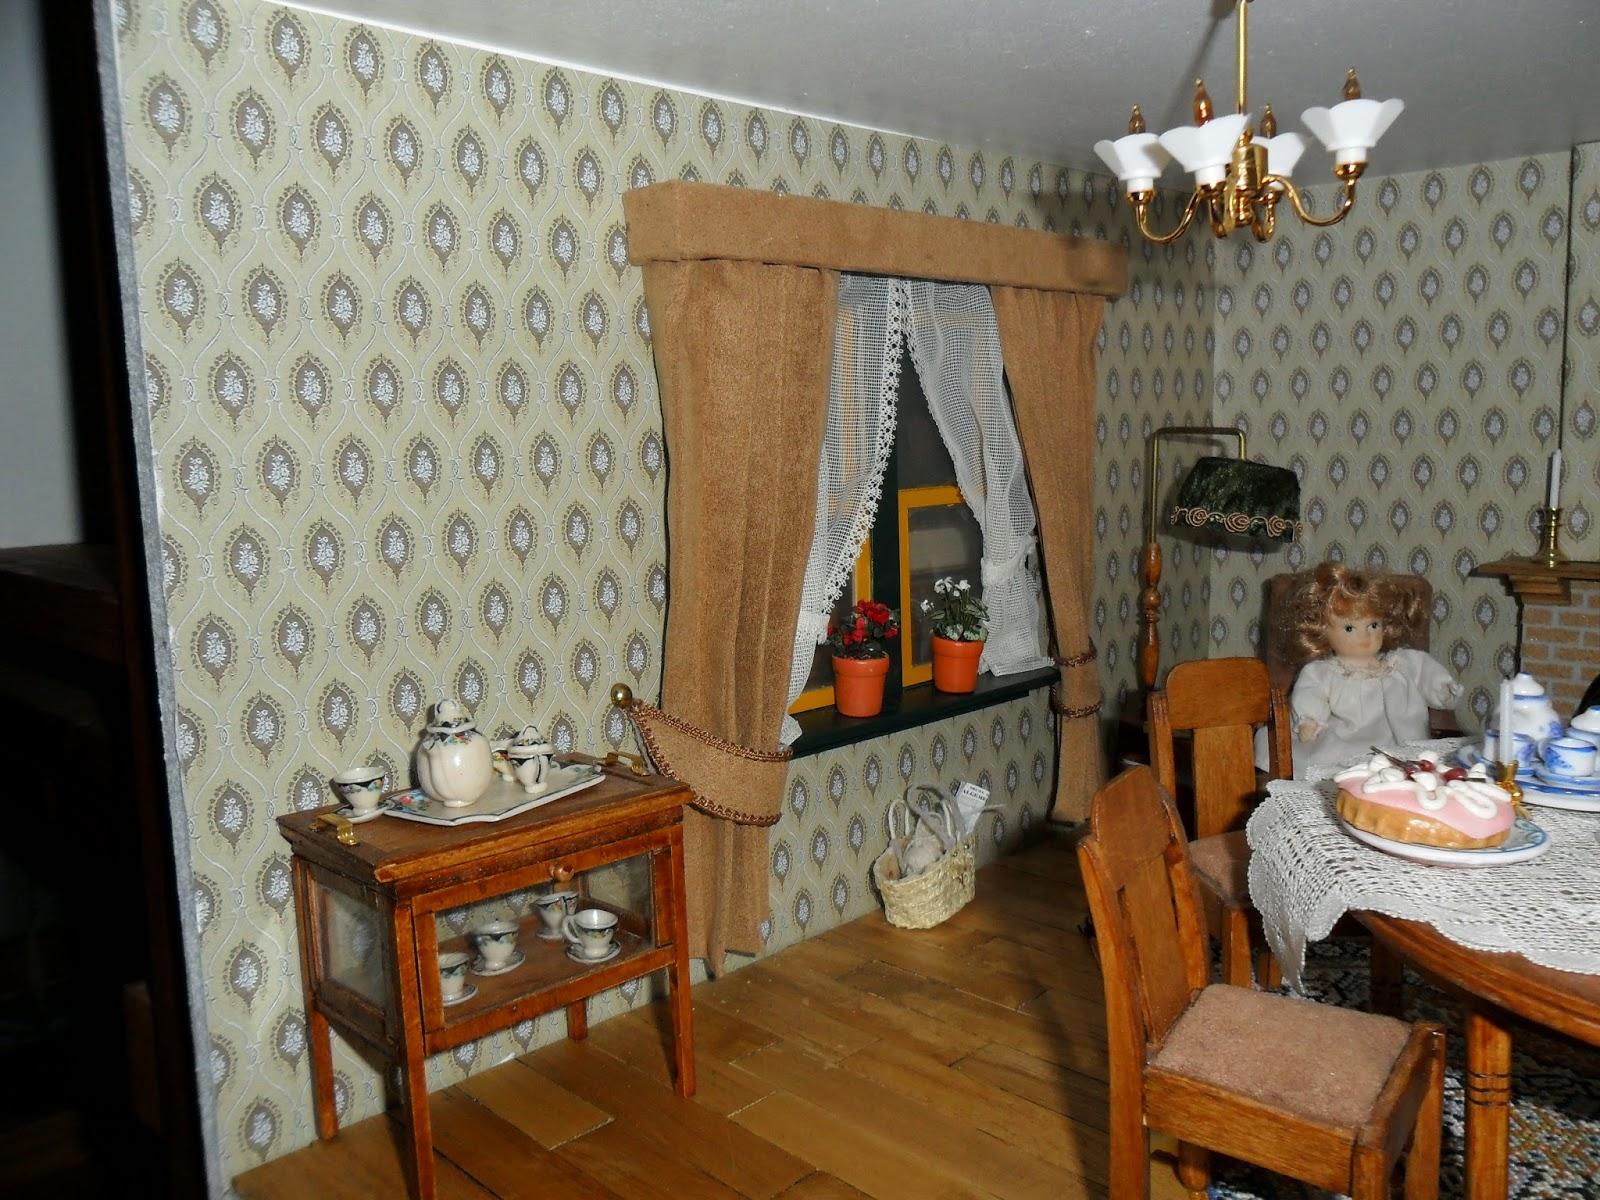 Crealenie\'s poppenhuis blog: Vitrage en gordijnen